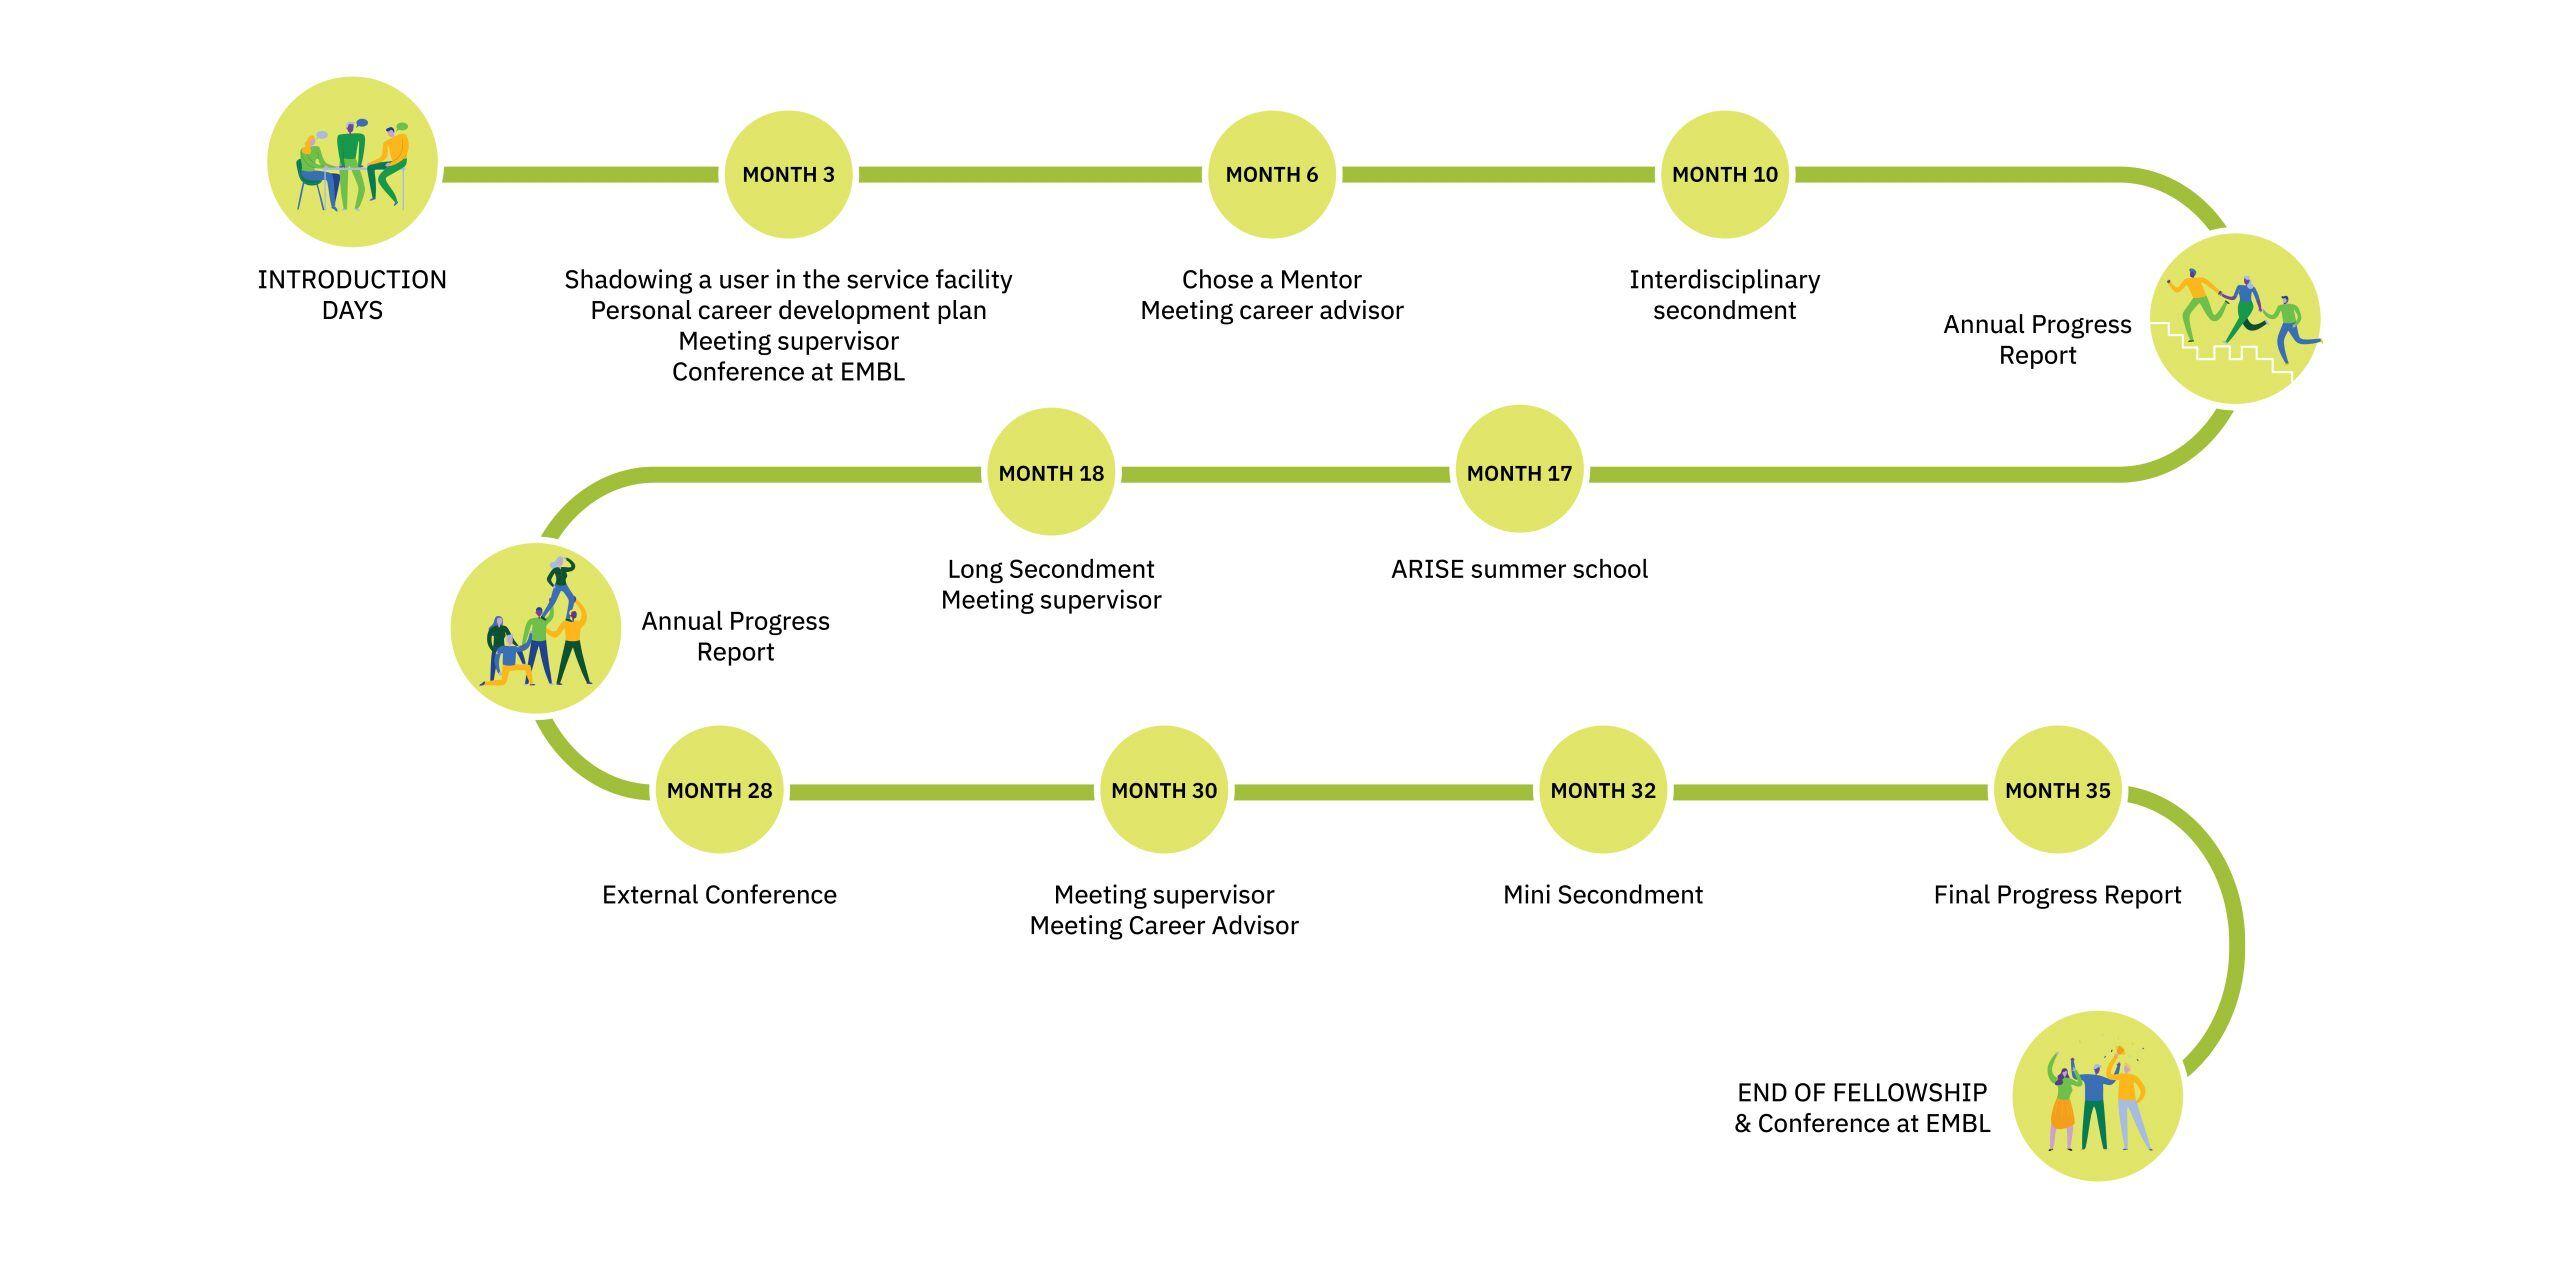 Timeline of ARISE Fellowship